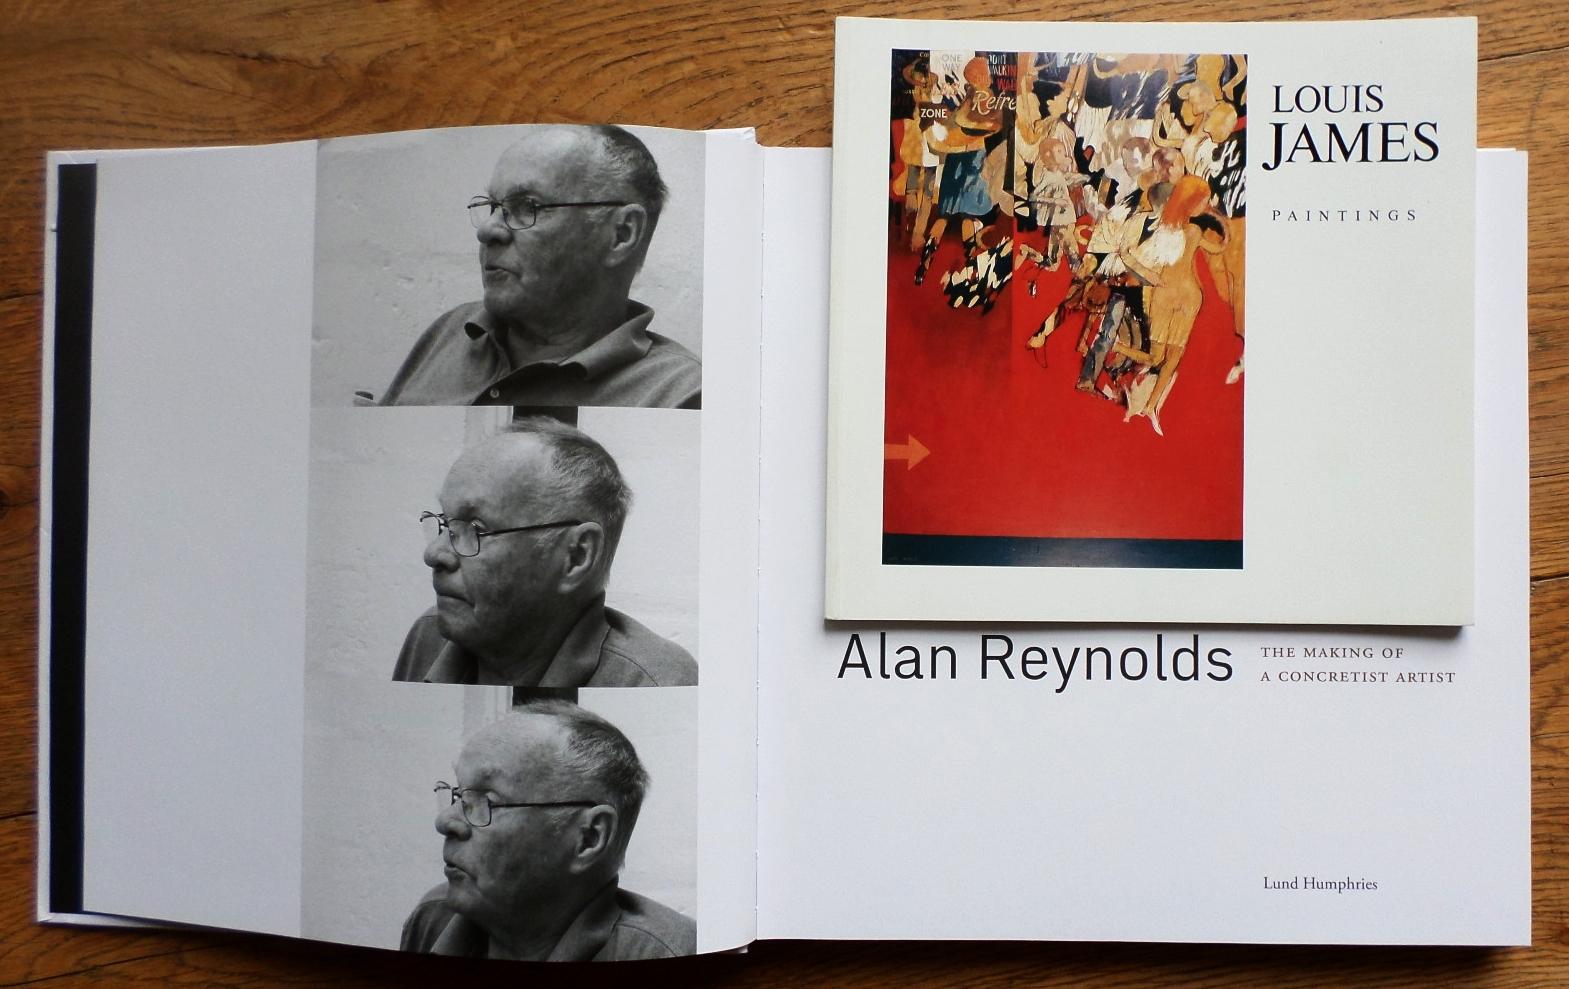 Alan Reynolds artist